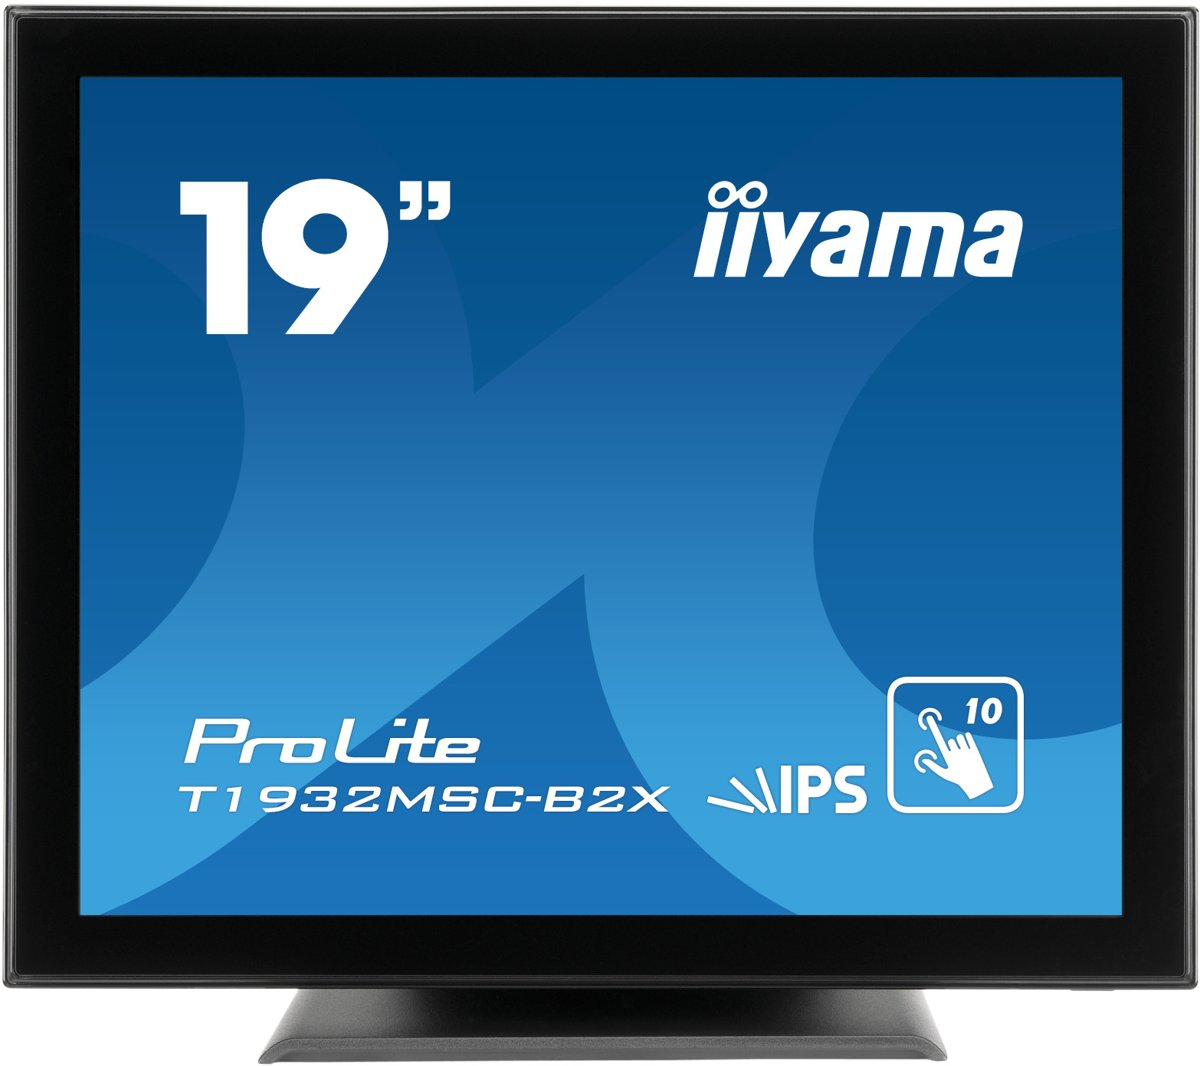 iiyama ProLite T1932MSC-B2X 19'' 1280 x 1024Pixels Multi-touch Zwart touch screen-monitor